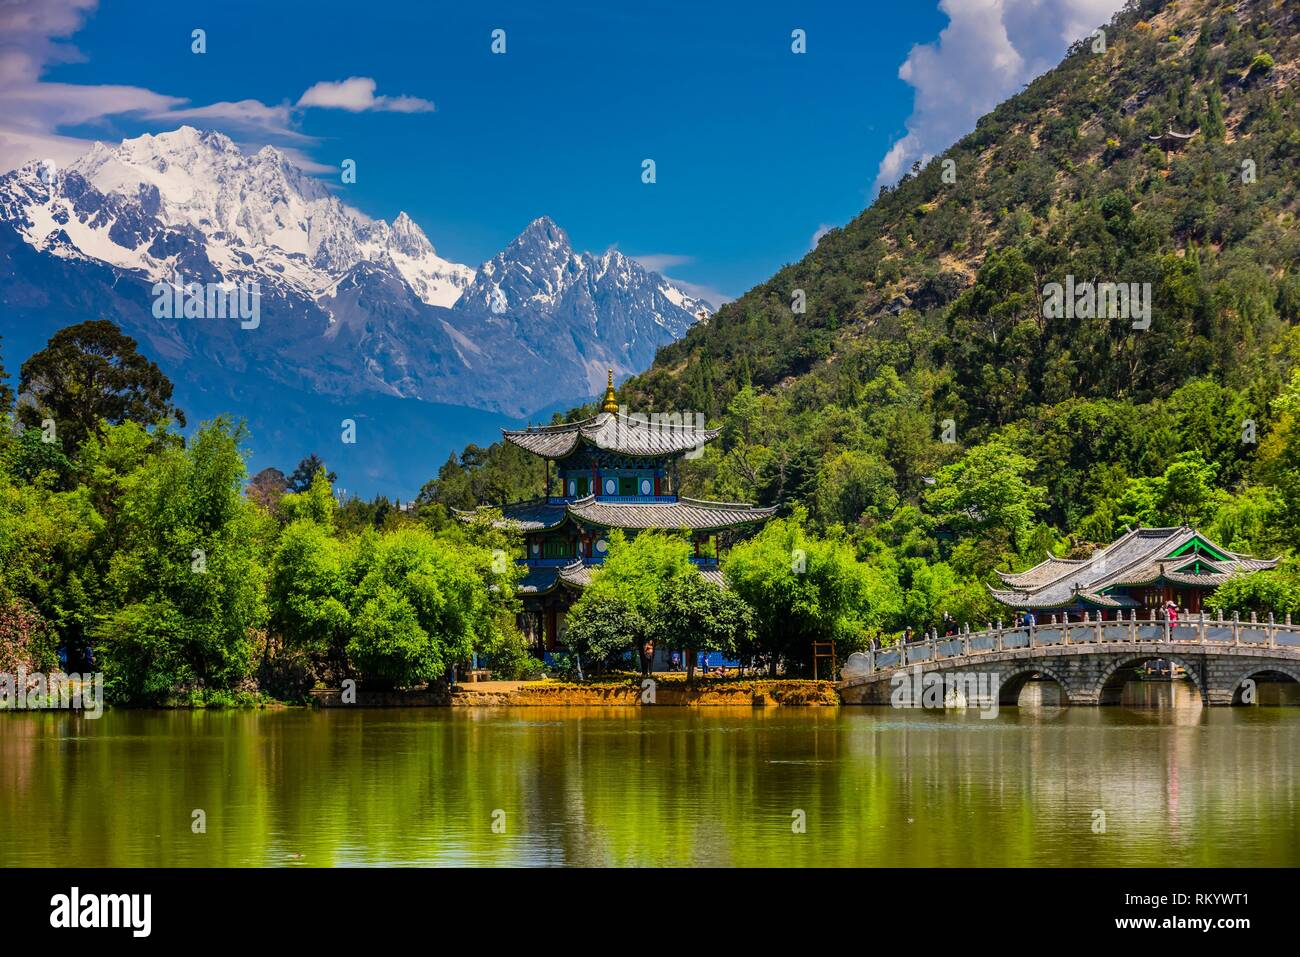 The idyllic Black Dragon Pool with the 18,360 foot Jade Dragon Snow Mountain behind, Lijiang, Yunnan Province, China. - Stock Image